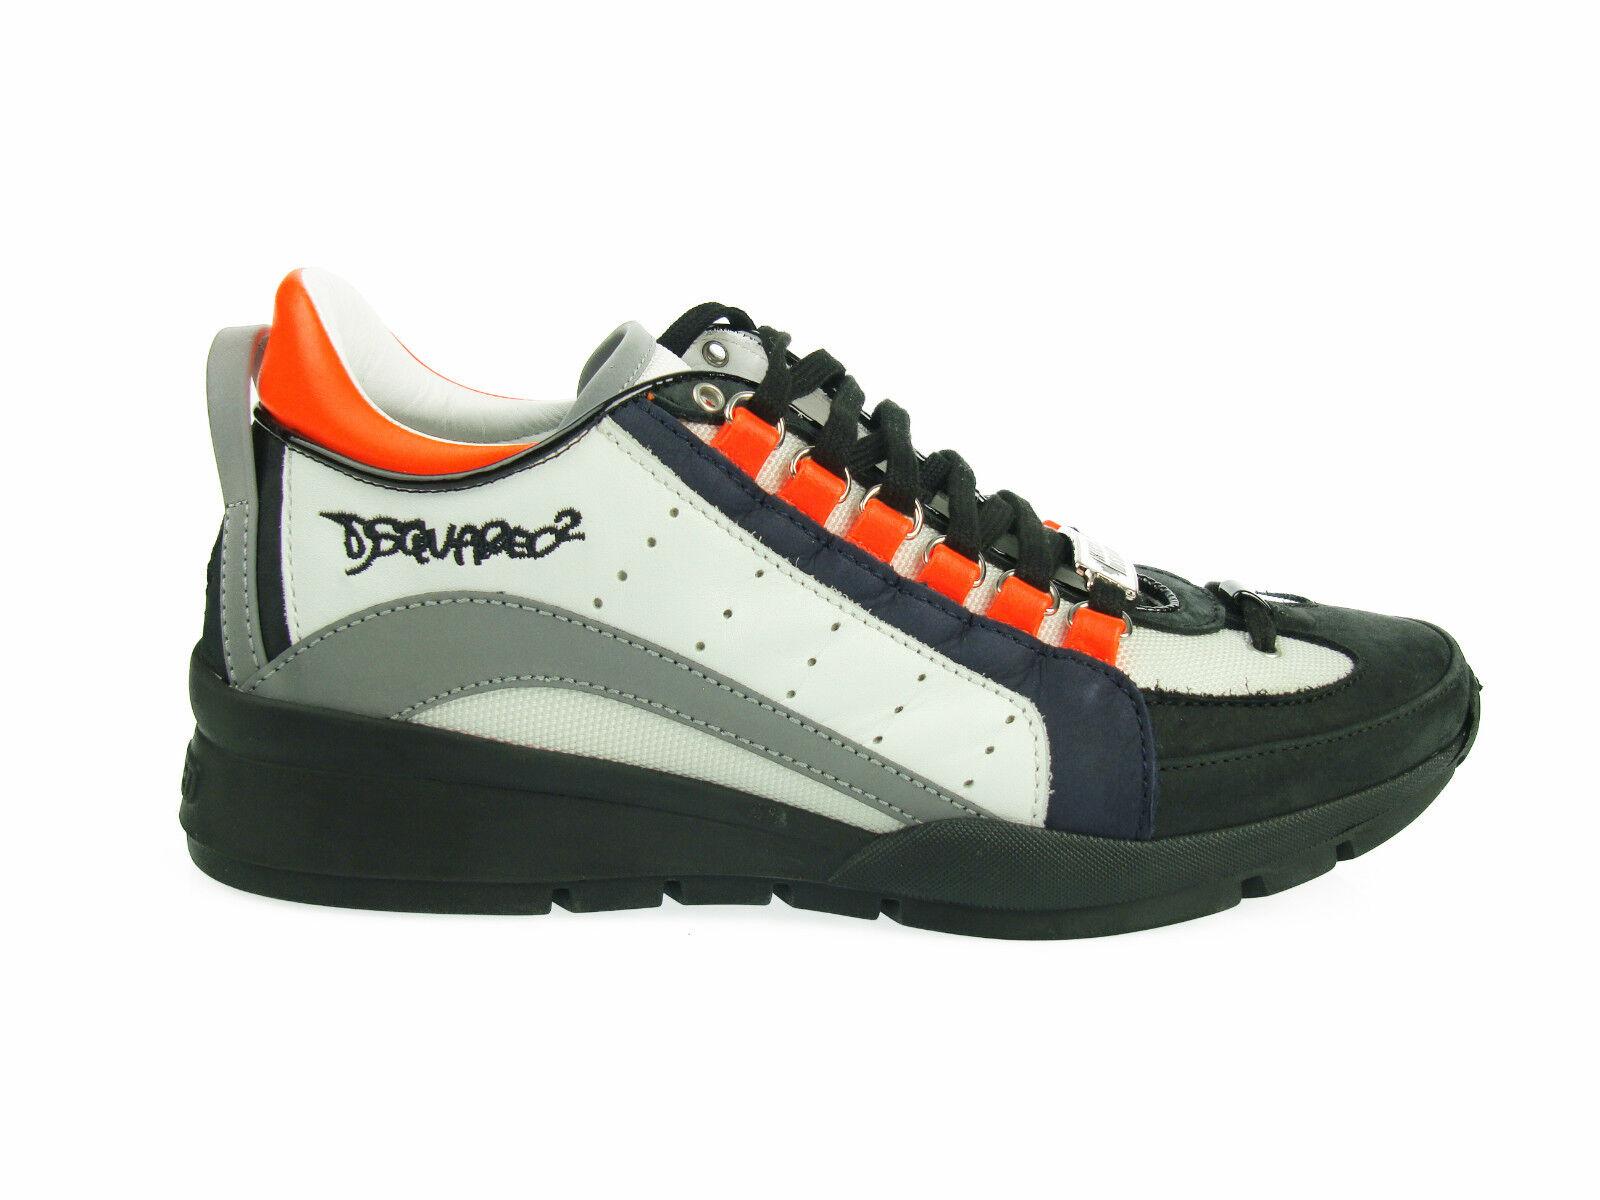 DSQUARED² SNEAKERS 551 320 Zapatos Hombre hombre Zapatos HerrenZapatos Zapatos 320  100%AUT ce04c0